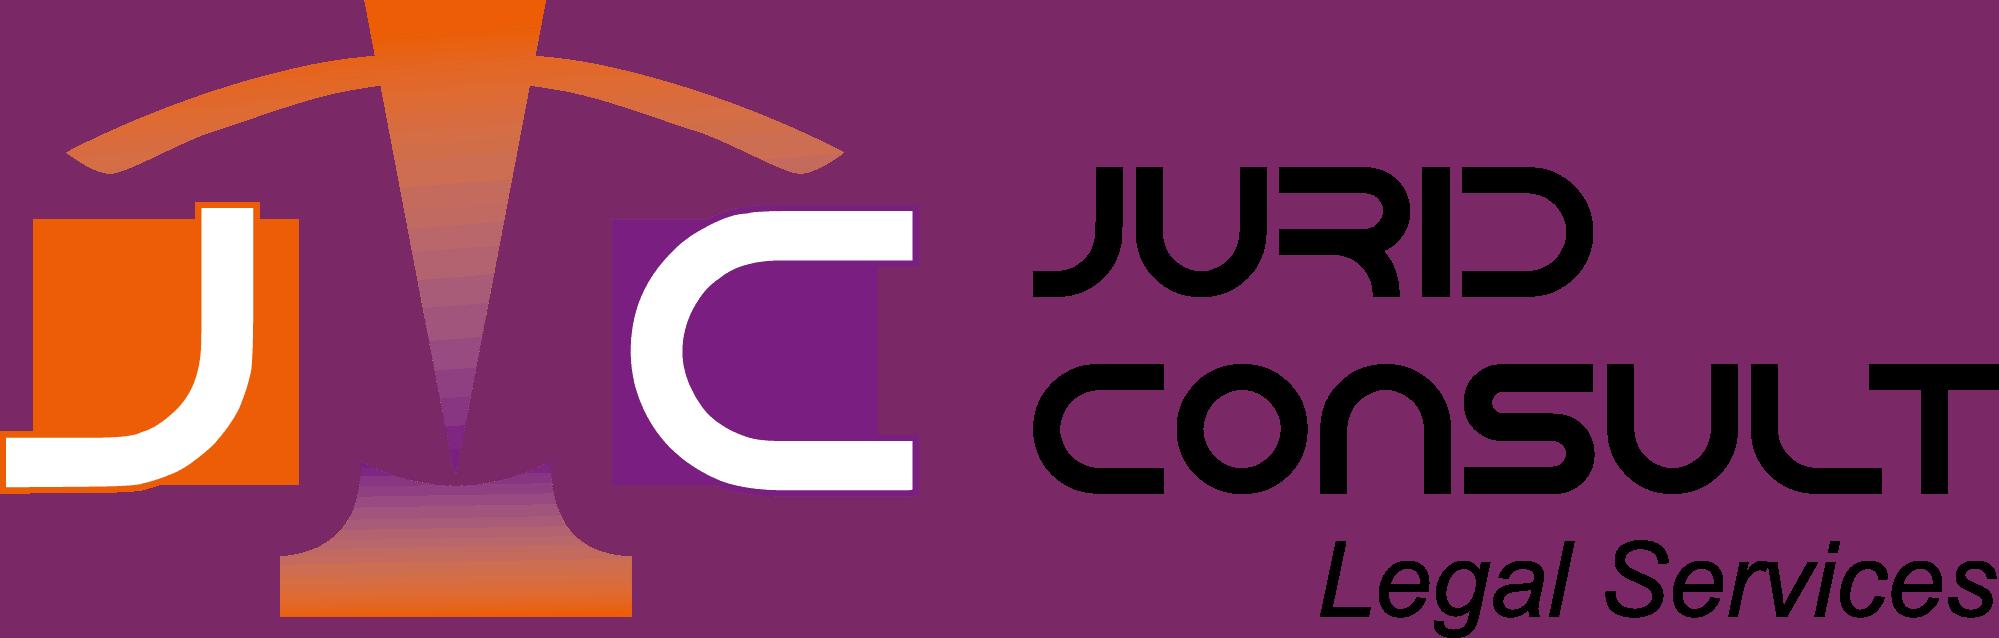 Jurid consult